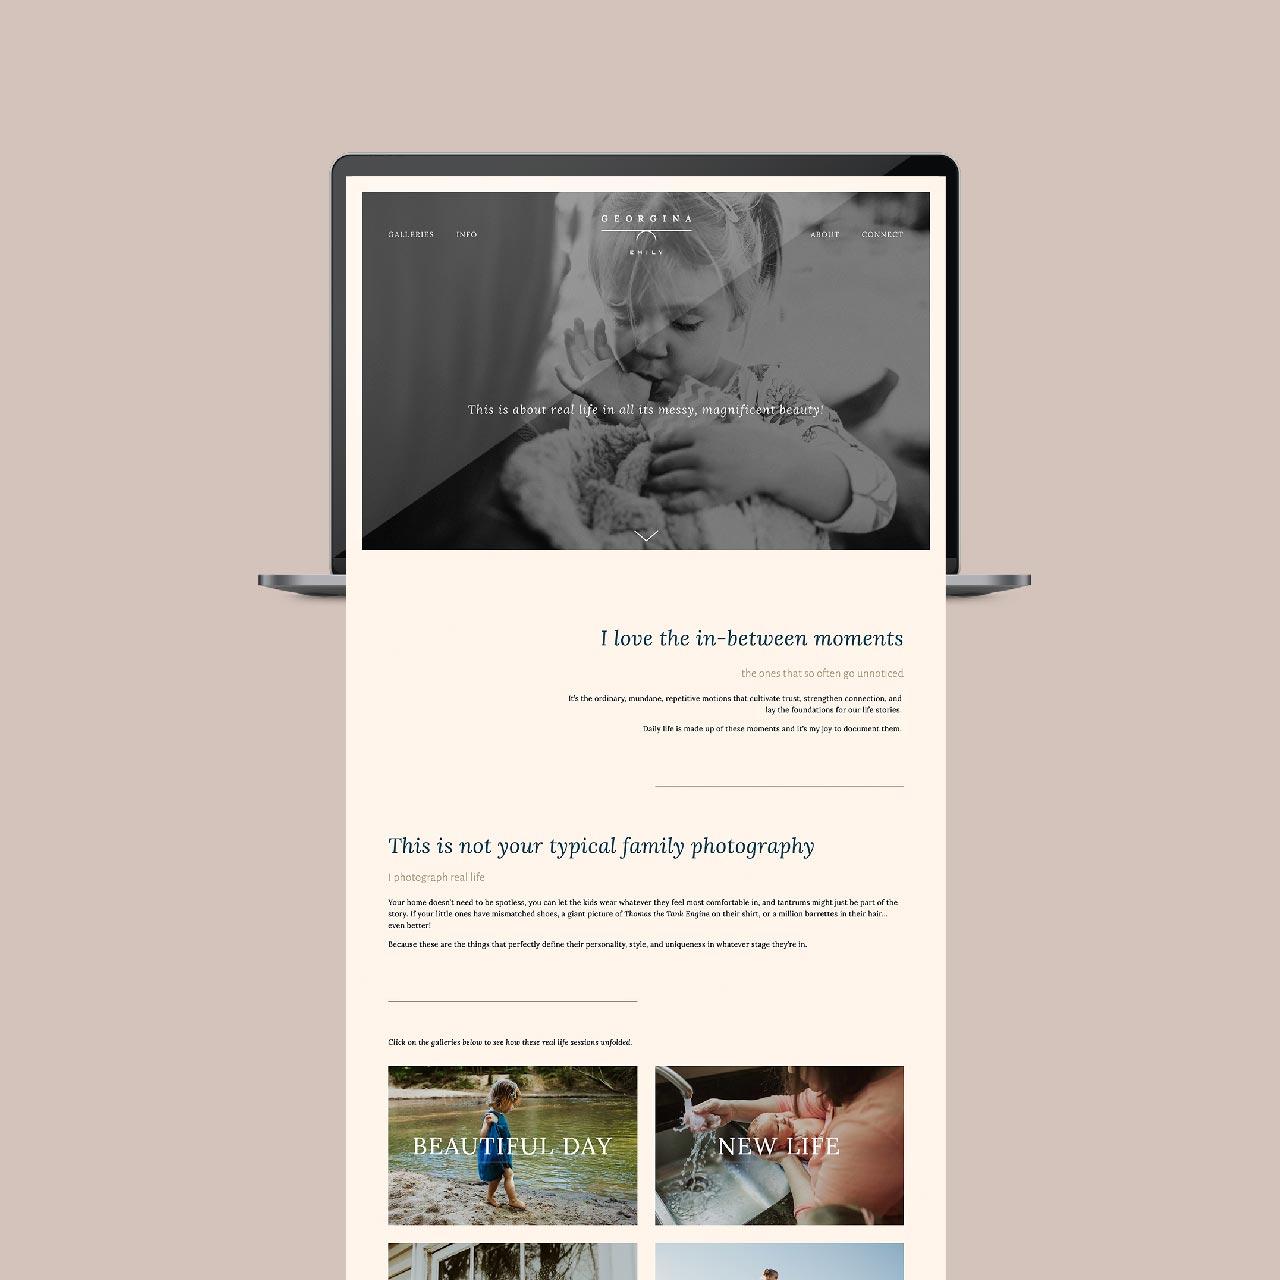 georginawebsite-01.jpg